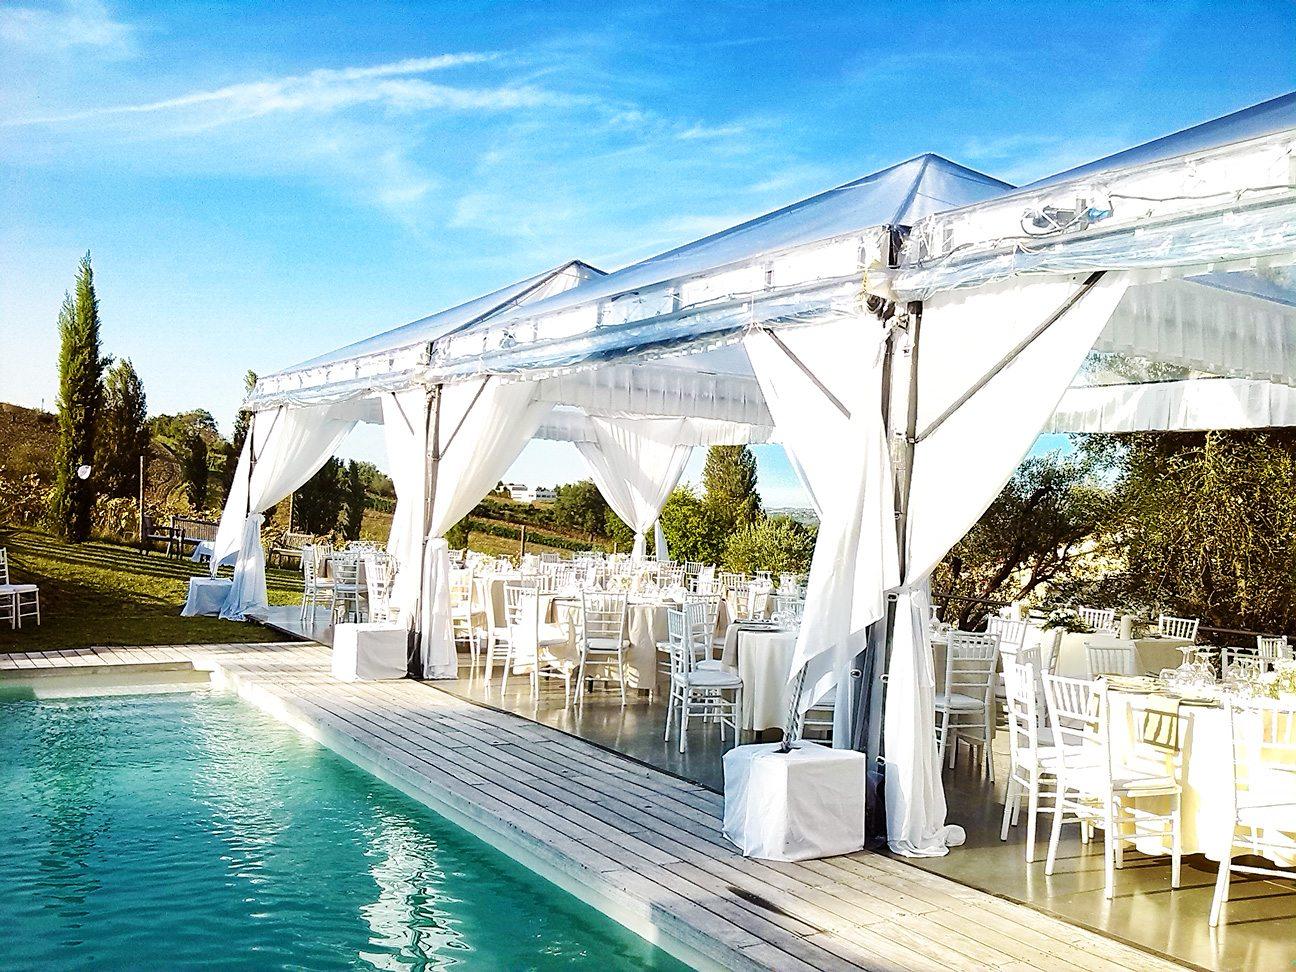 Allestimento elegance a bordo piscina c s eurofiere for Matrimonio bordo piscina